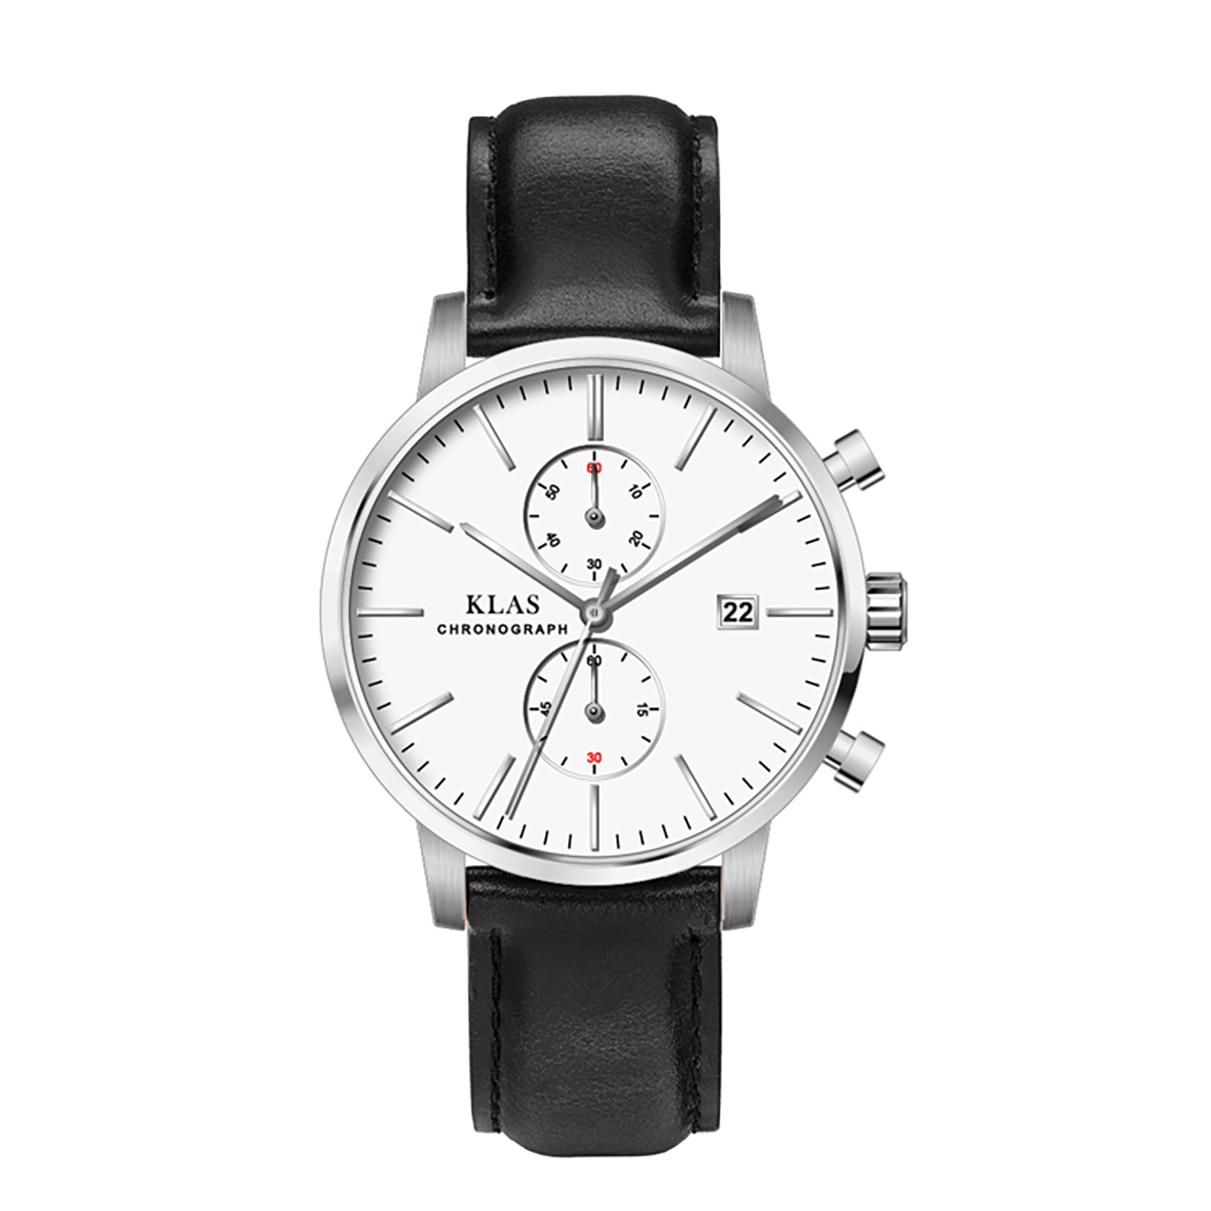 Для мужчин Брендовые Часы KLAS бренд